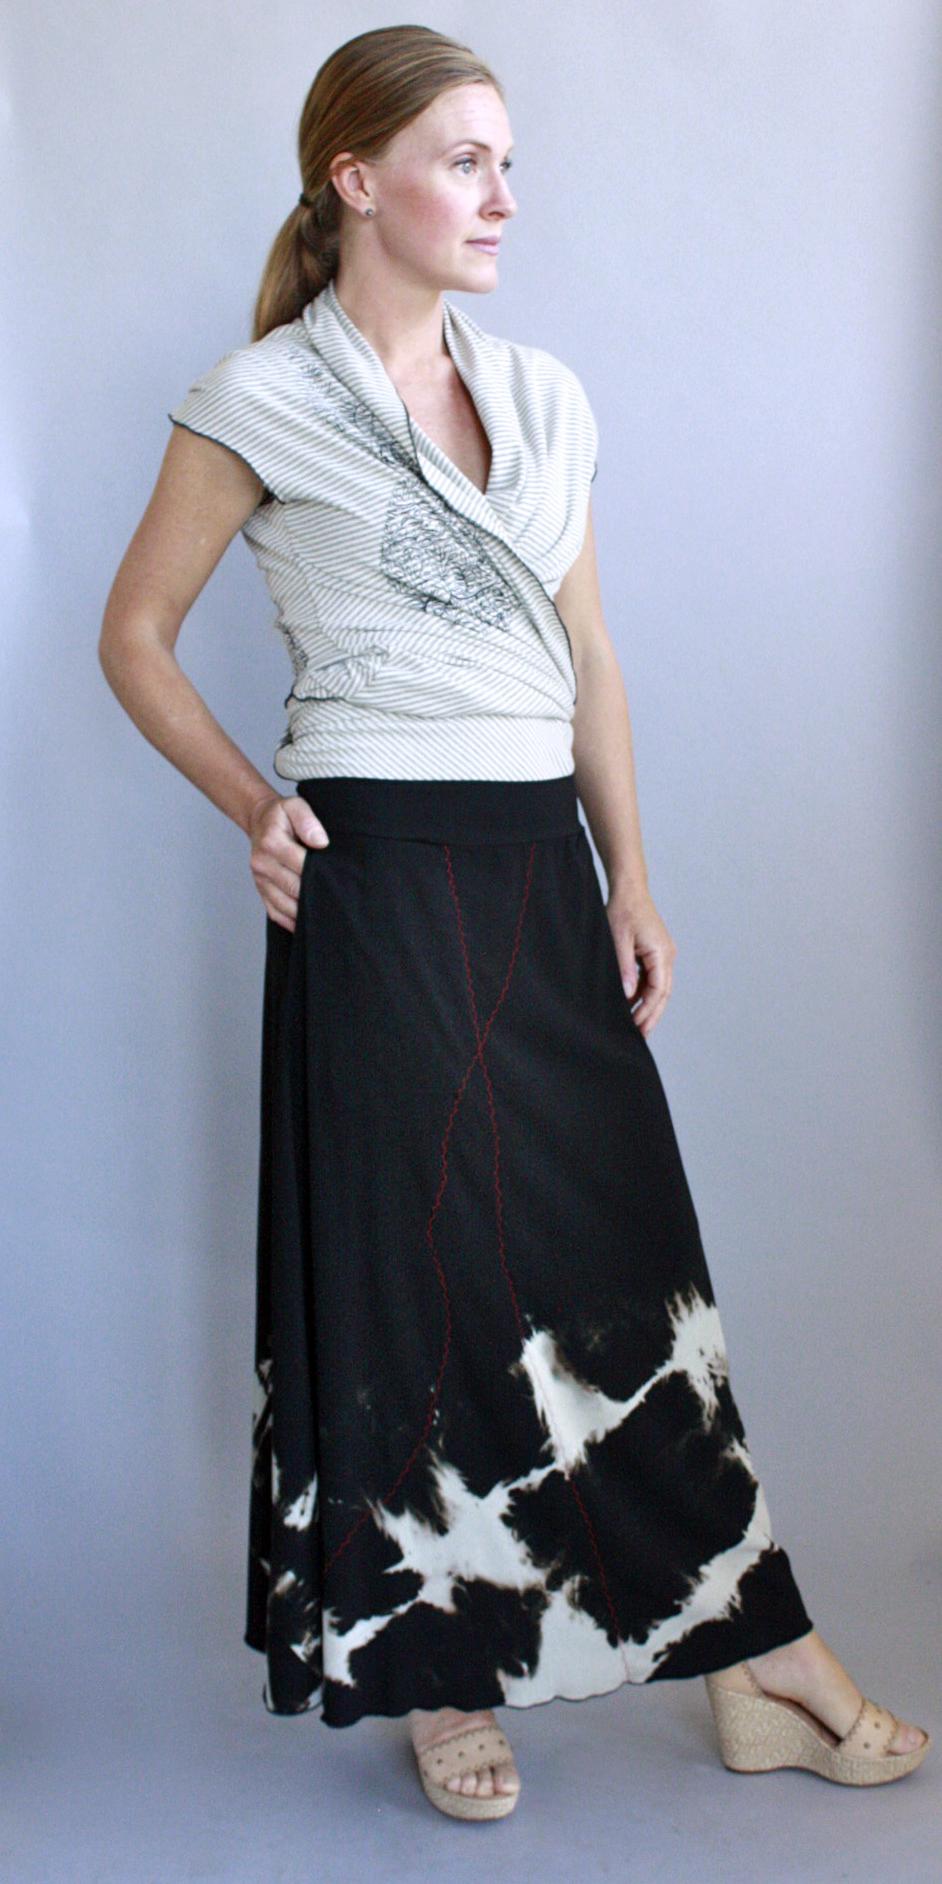 Luna Cardigan & Beeline Skirt